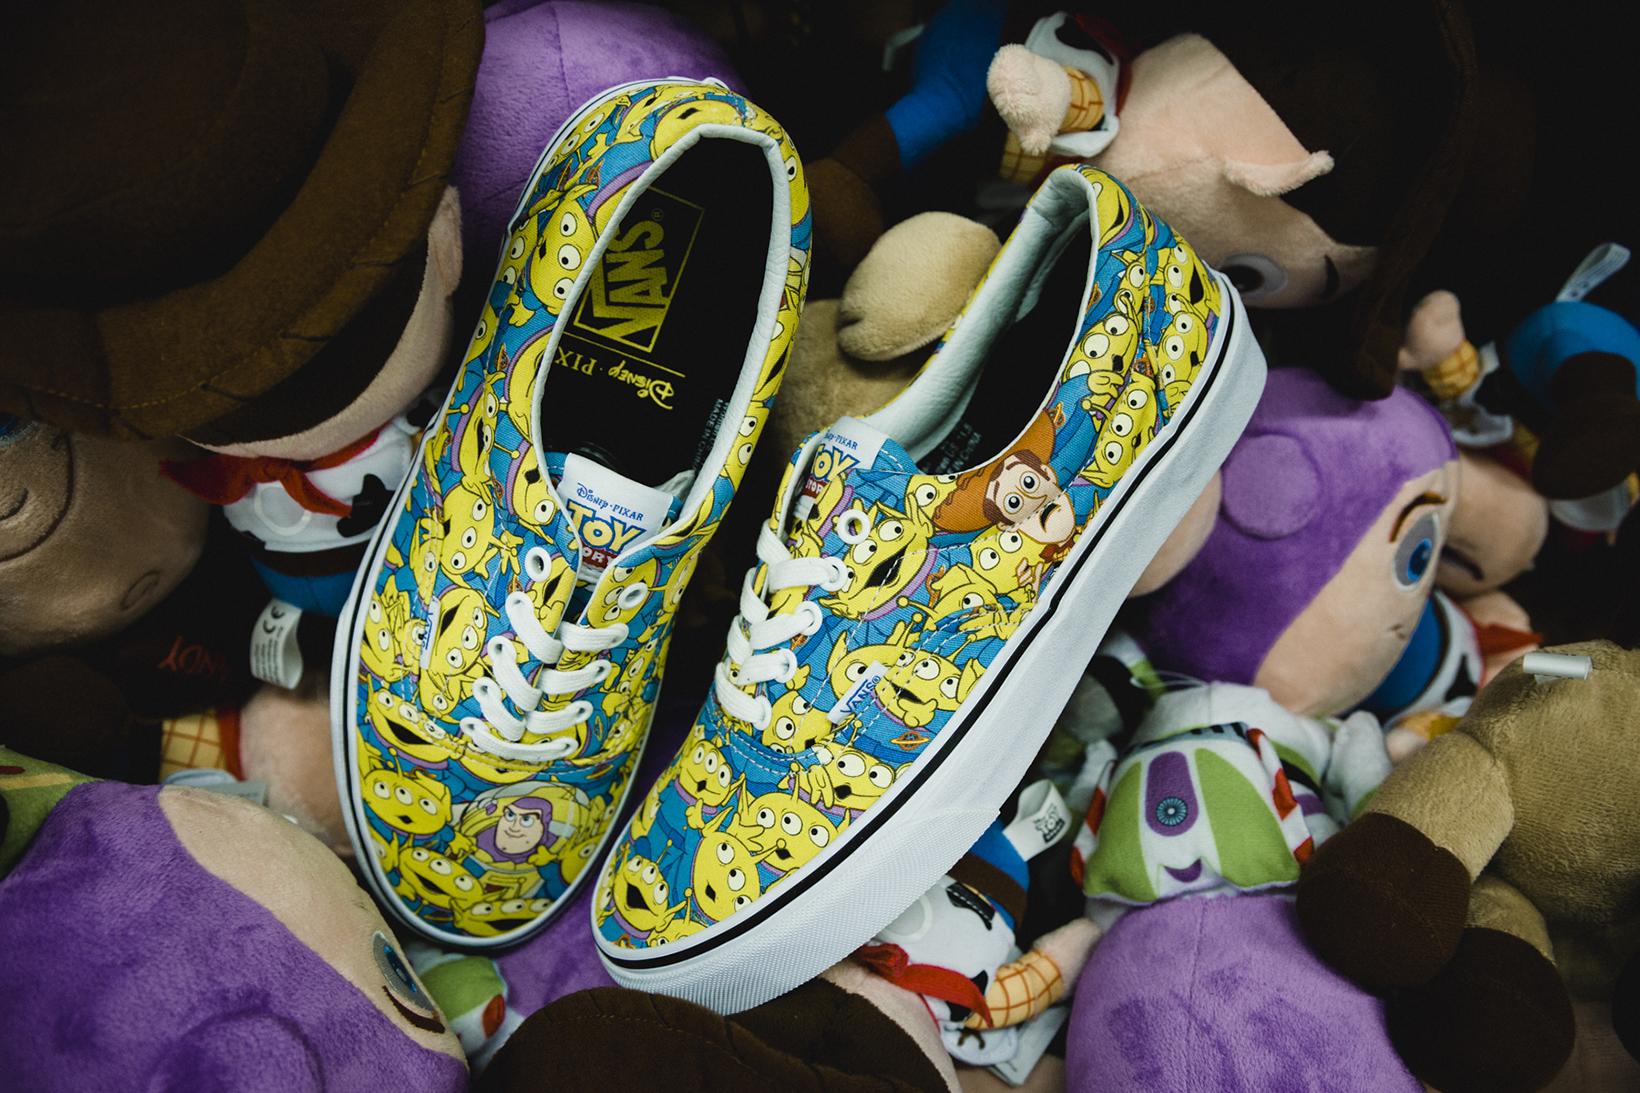 Toy Story Vans Sneakers Woody Buzz Lightyear Disney - 1765027